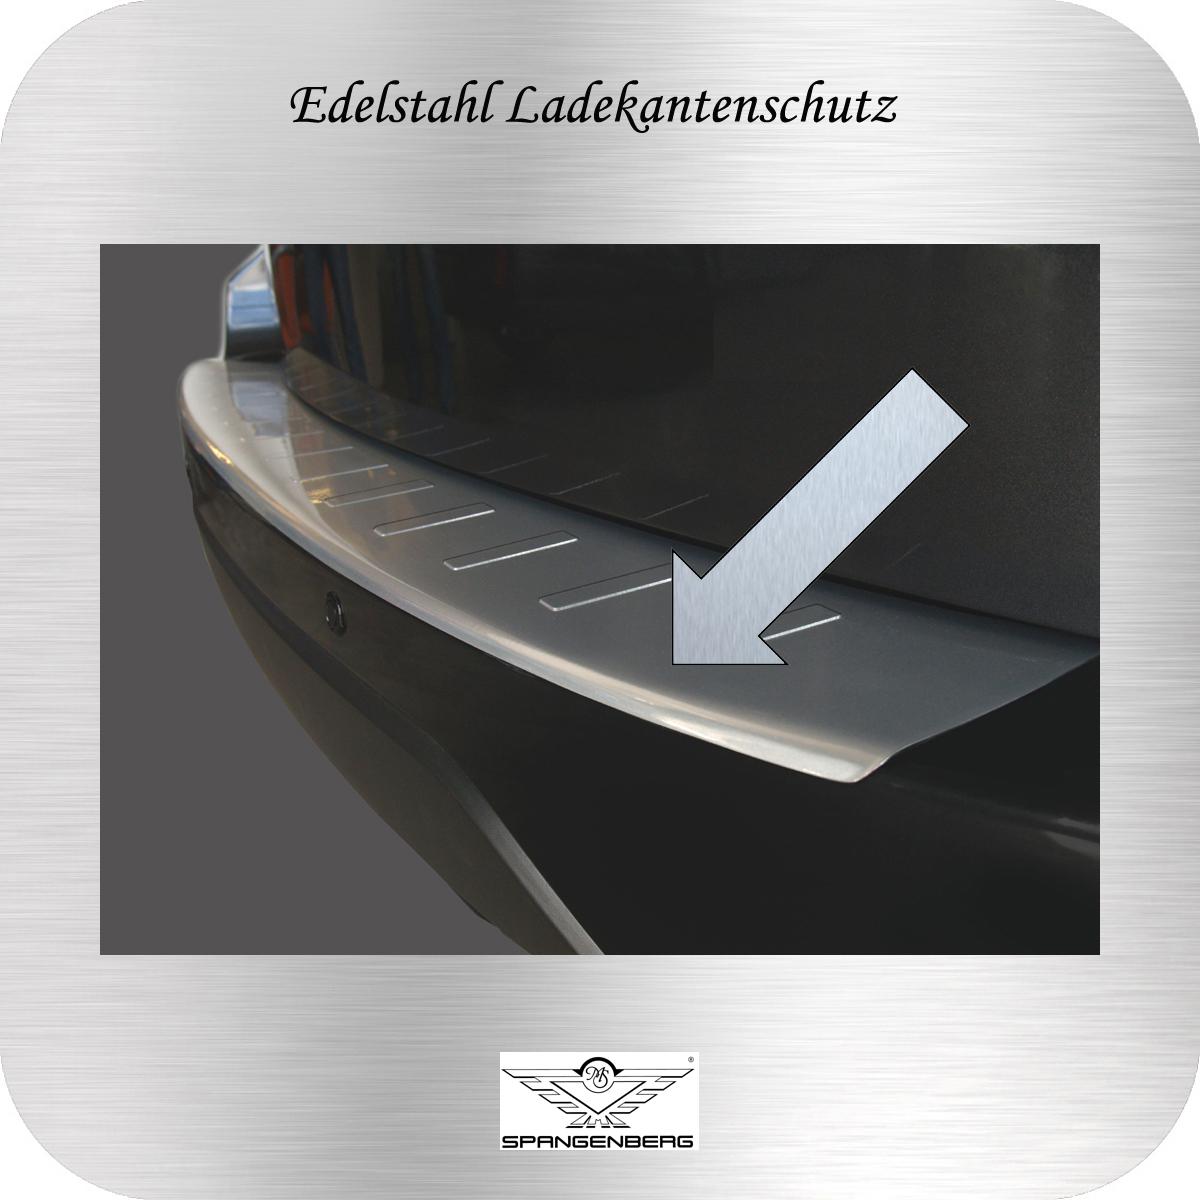 Ladekantenschutz Edelstahl Subaru Forester III SUV Kombi Typ SH 2008-13 3235036